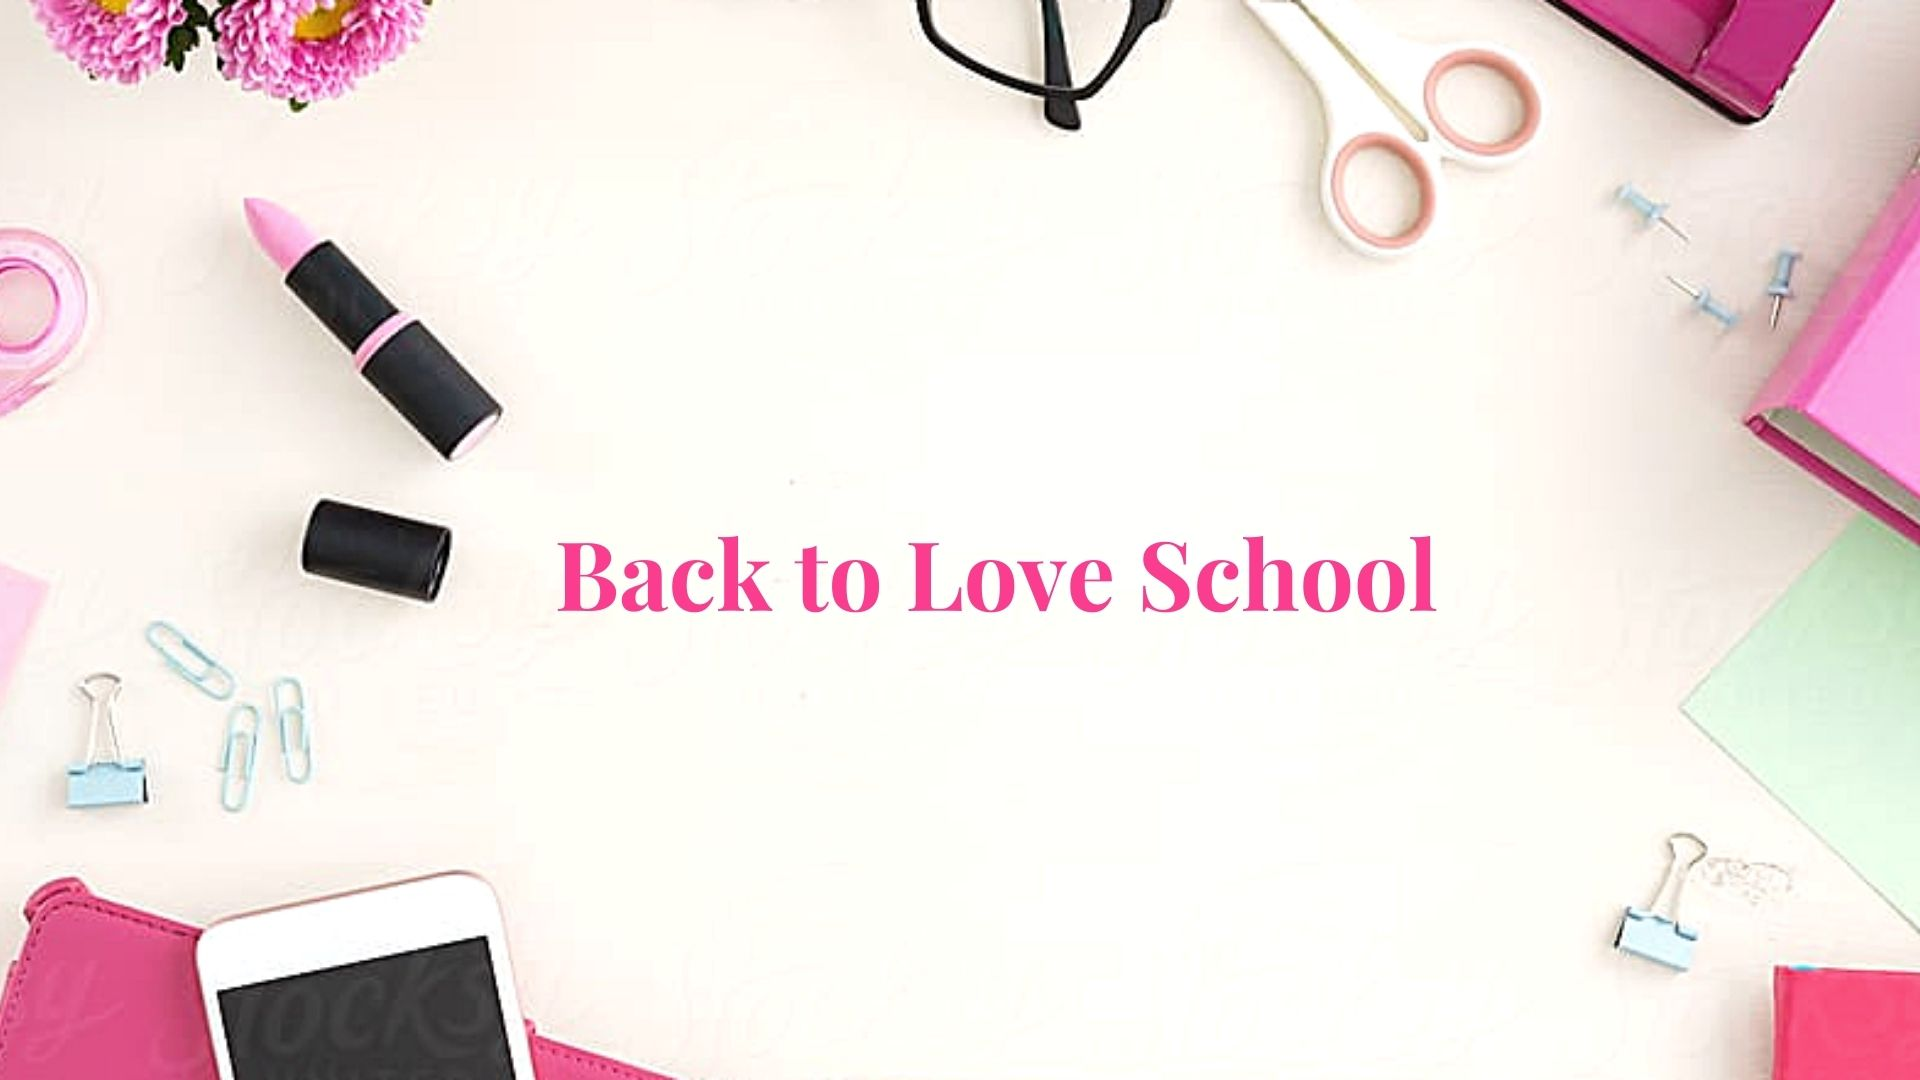 Back to Love School